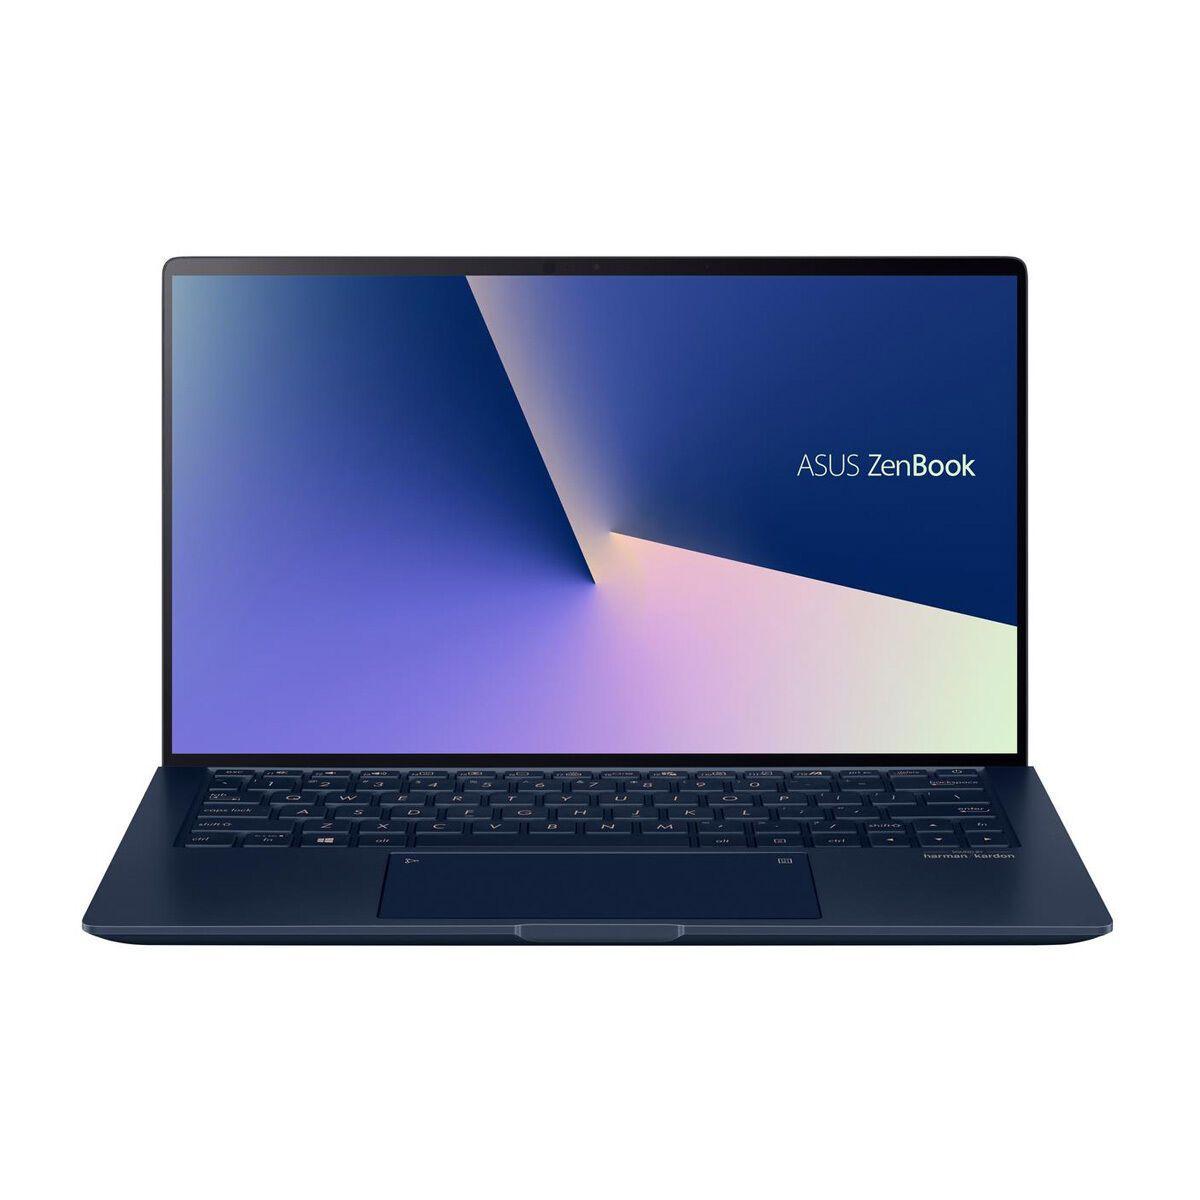 "Asus ZenBook 13 UX333FA-A3253 mit 13,3"" Full-HD NanoEdge, i5-8265U, 8GB RAM, 512GB SSD, 1,33 kg [NBB]"